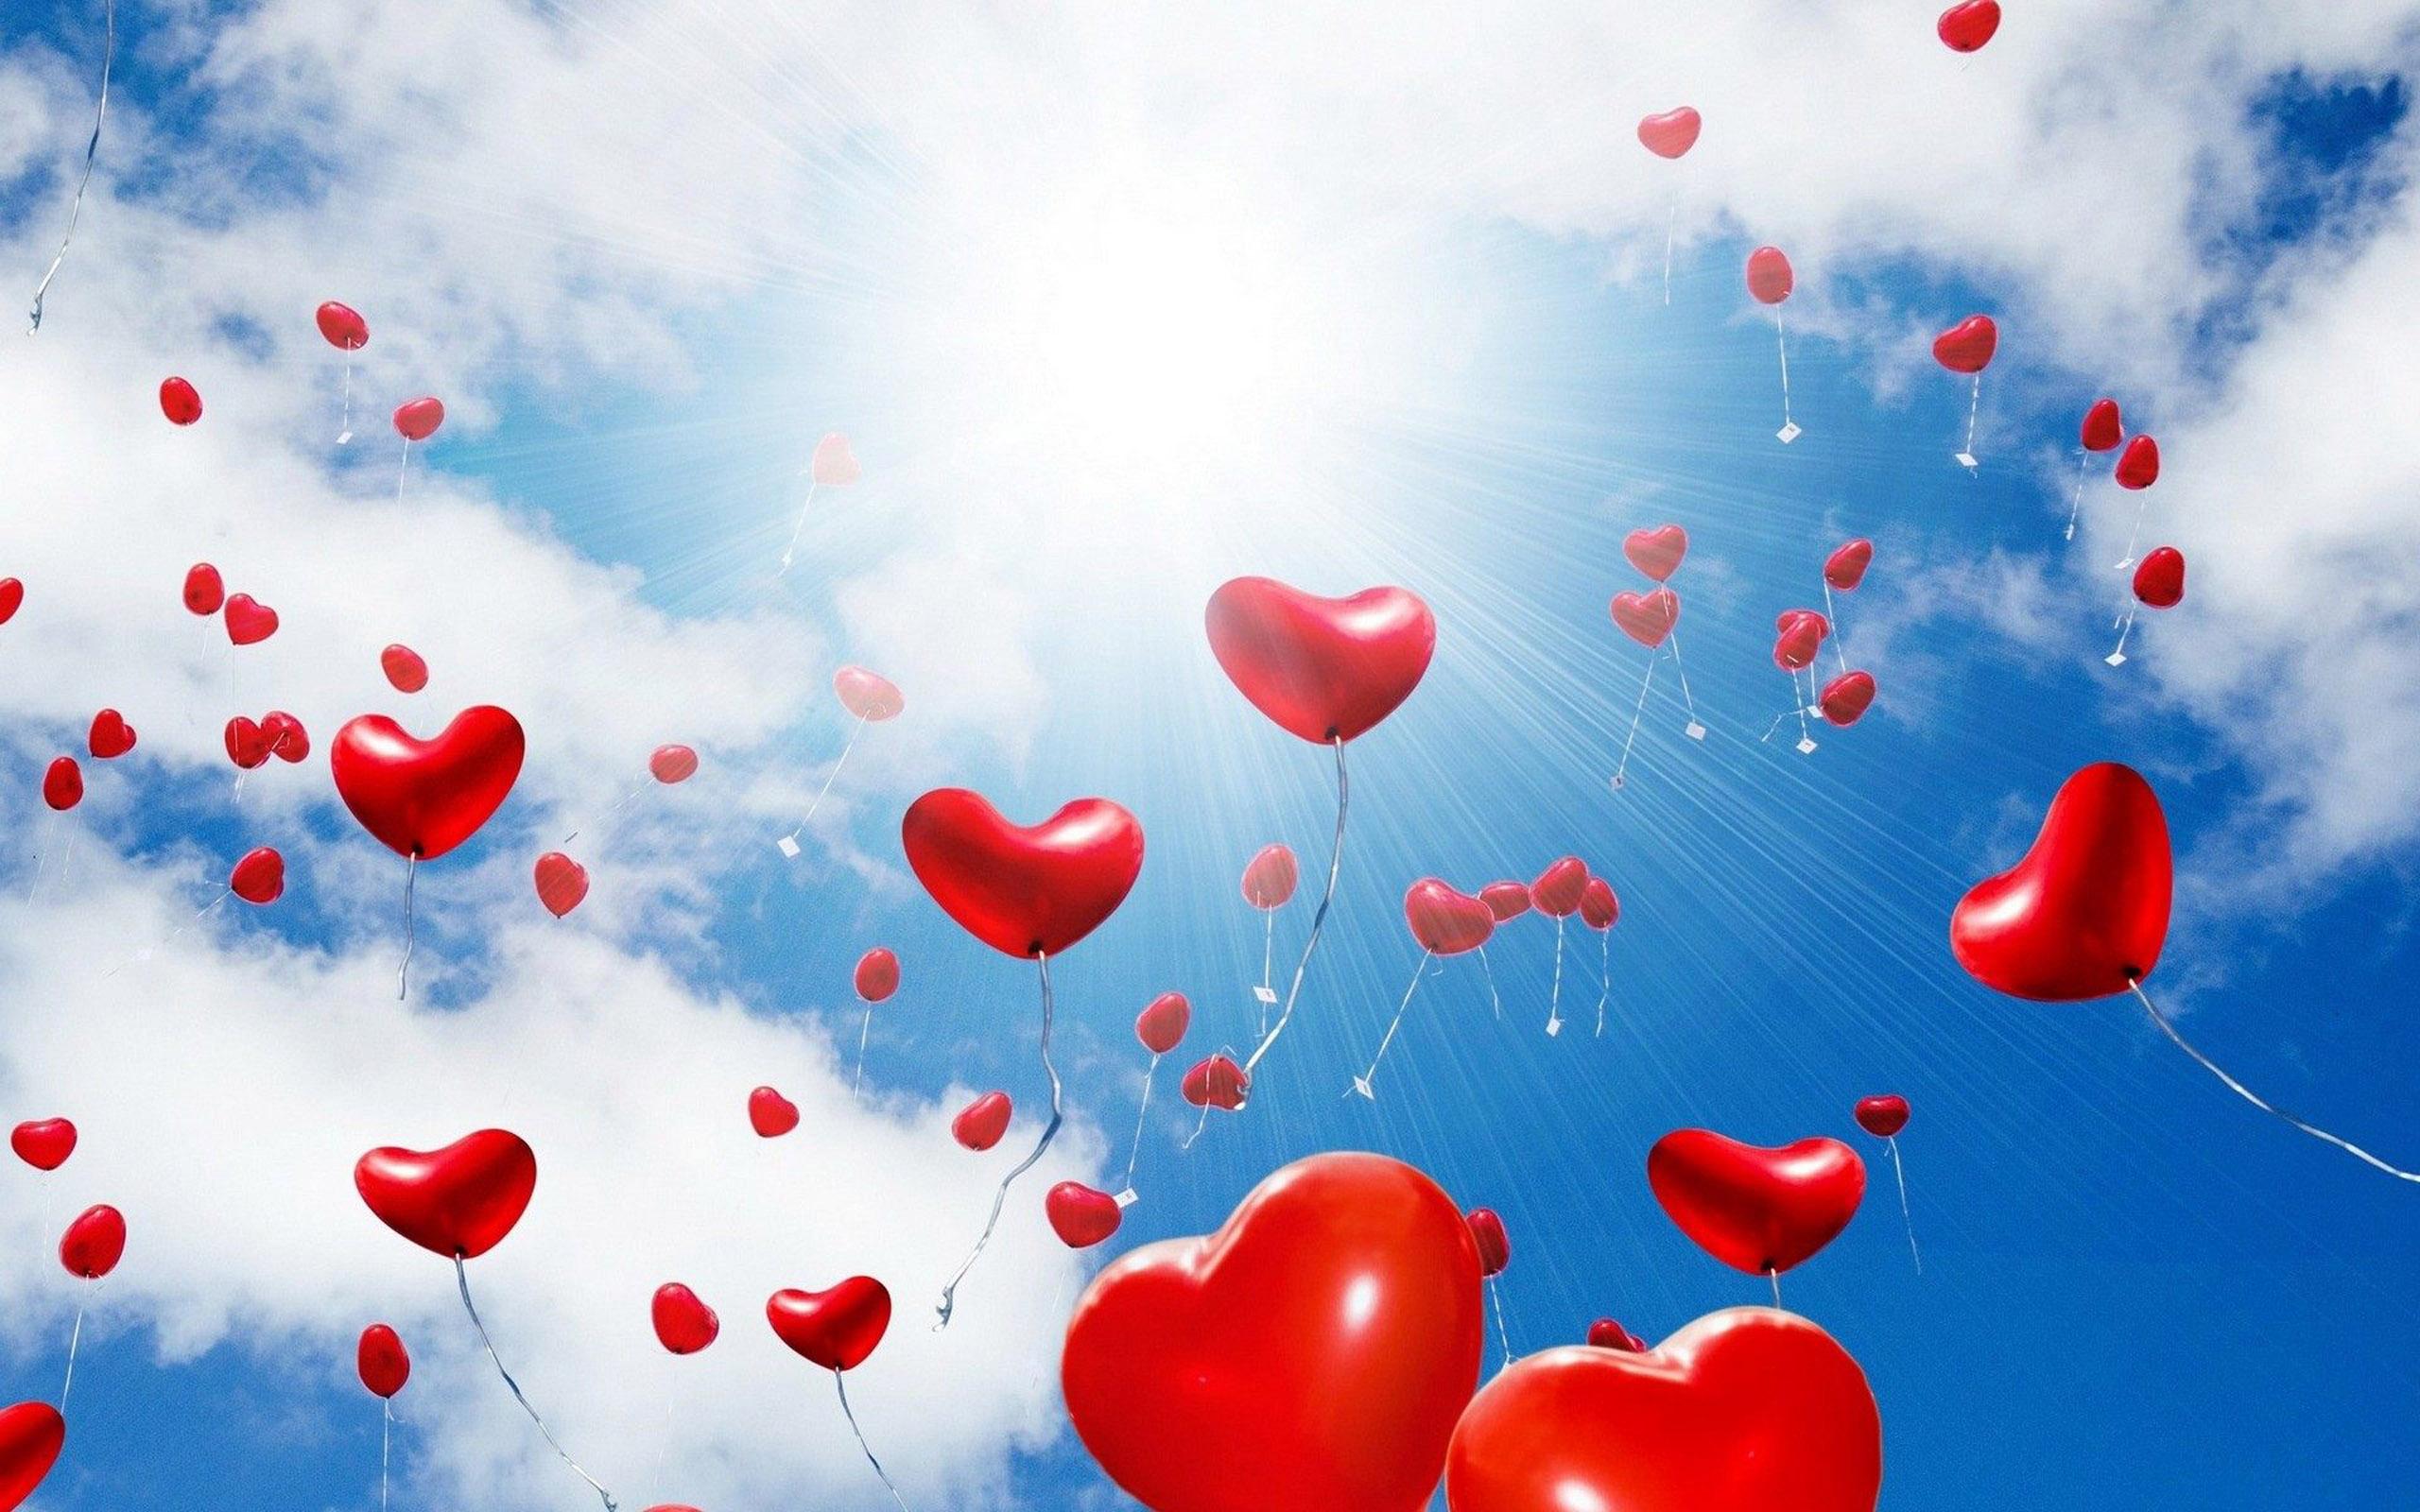 Girl Boy Love Birds Wallpaper Download Red Balloons In The Shape Of A Heart Sunlight Blue Sky